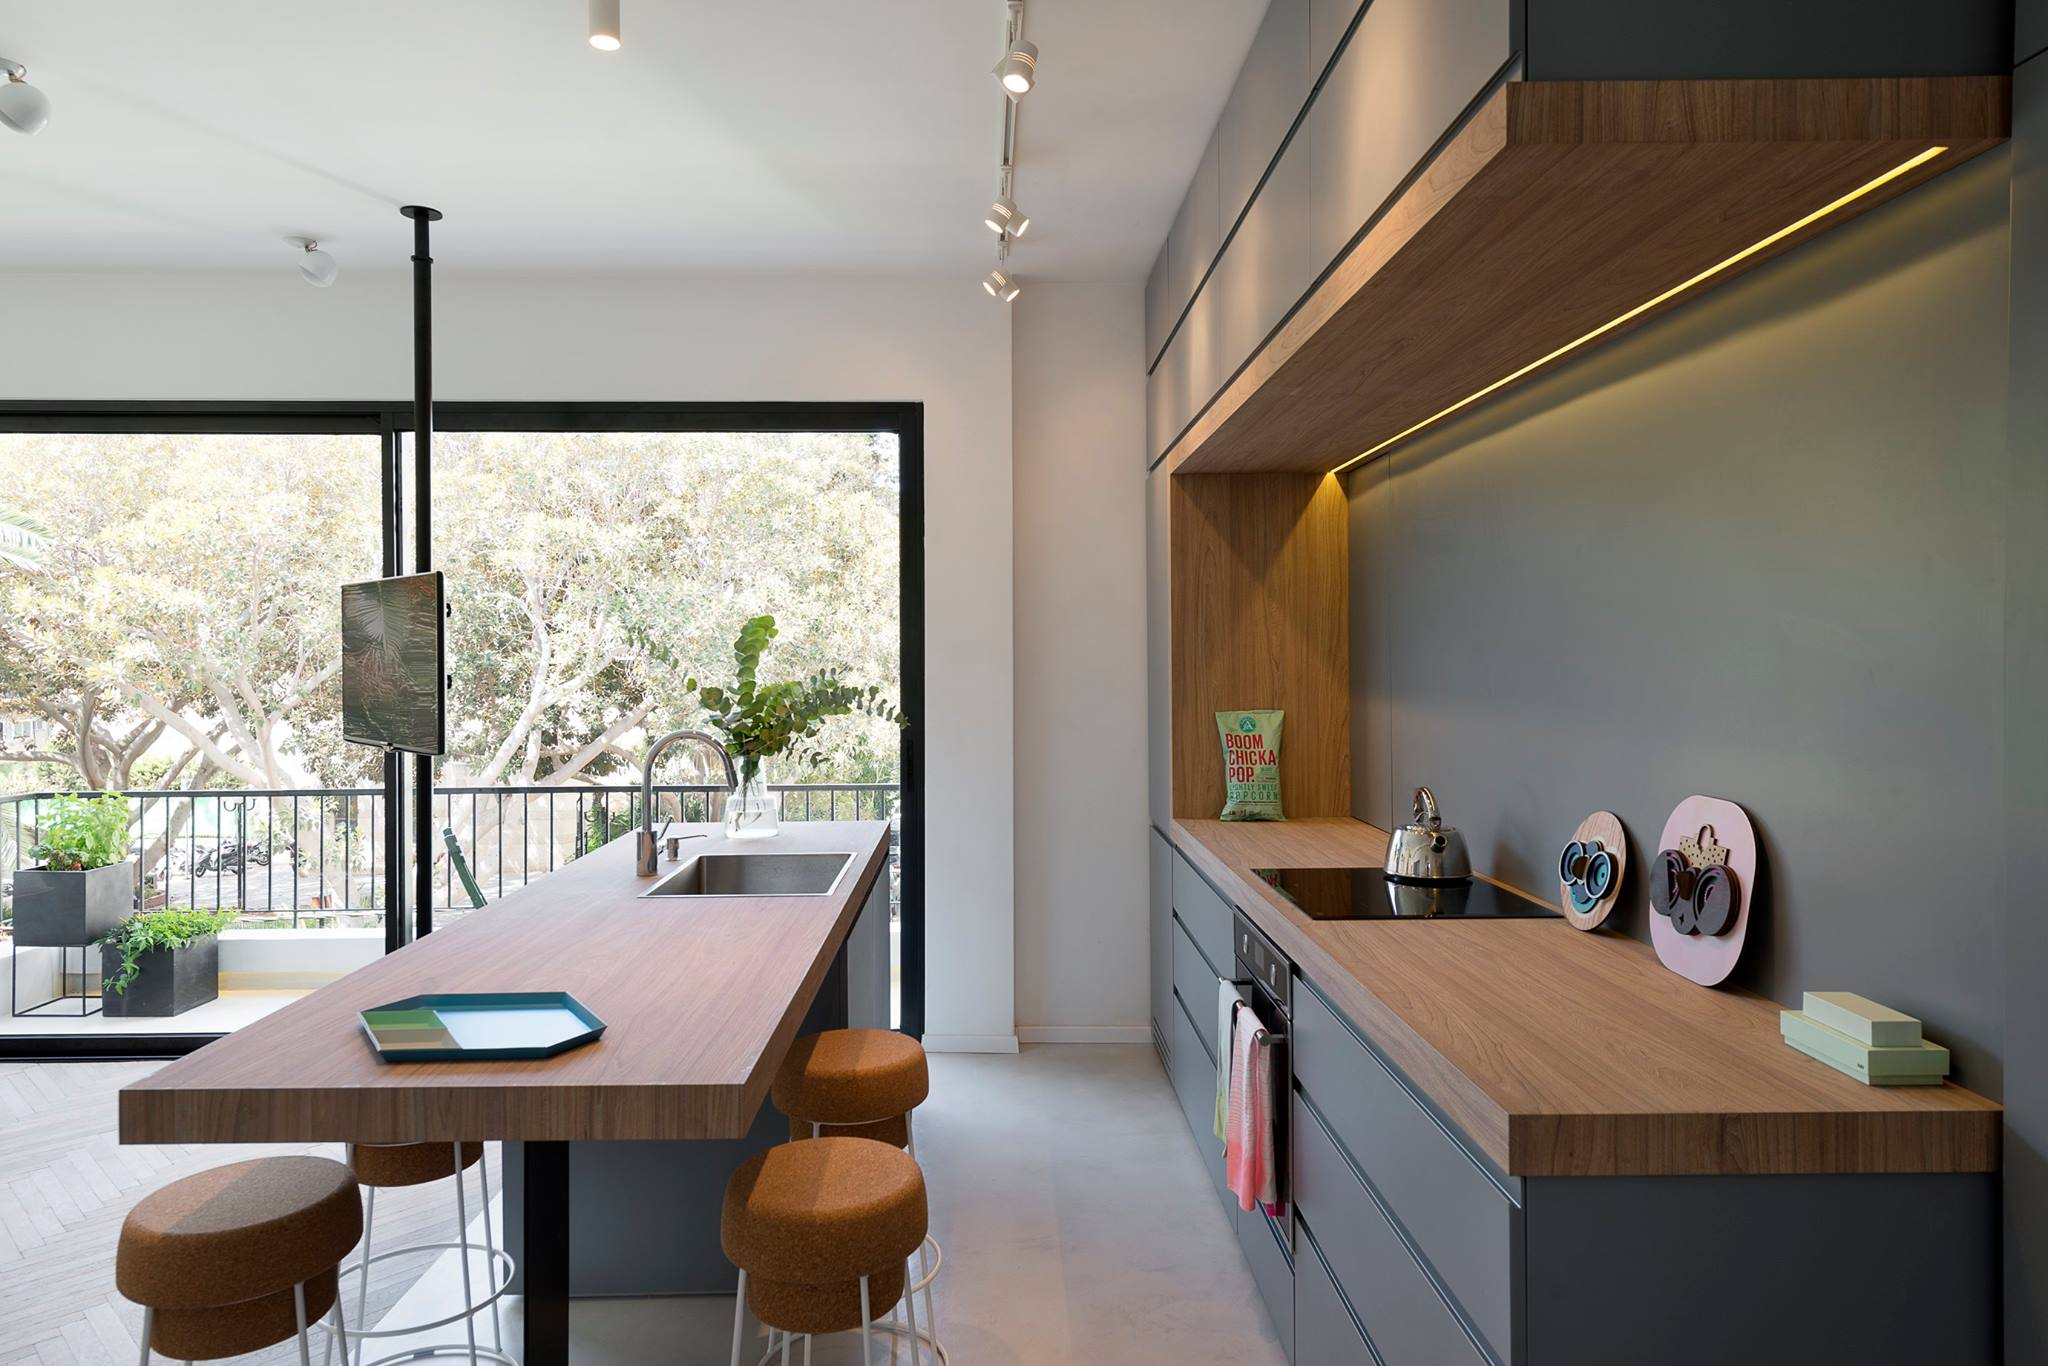 35 ispirazioni per una arredare la cucina a vista - Living ...